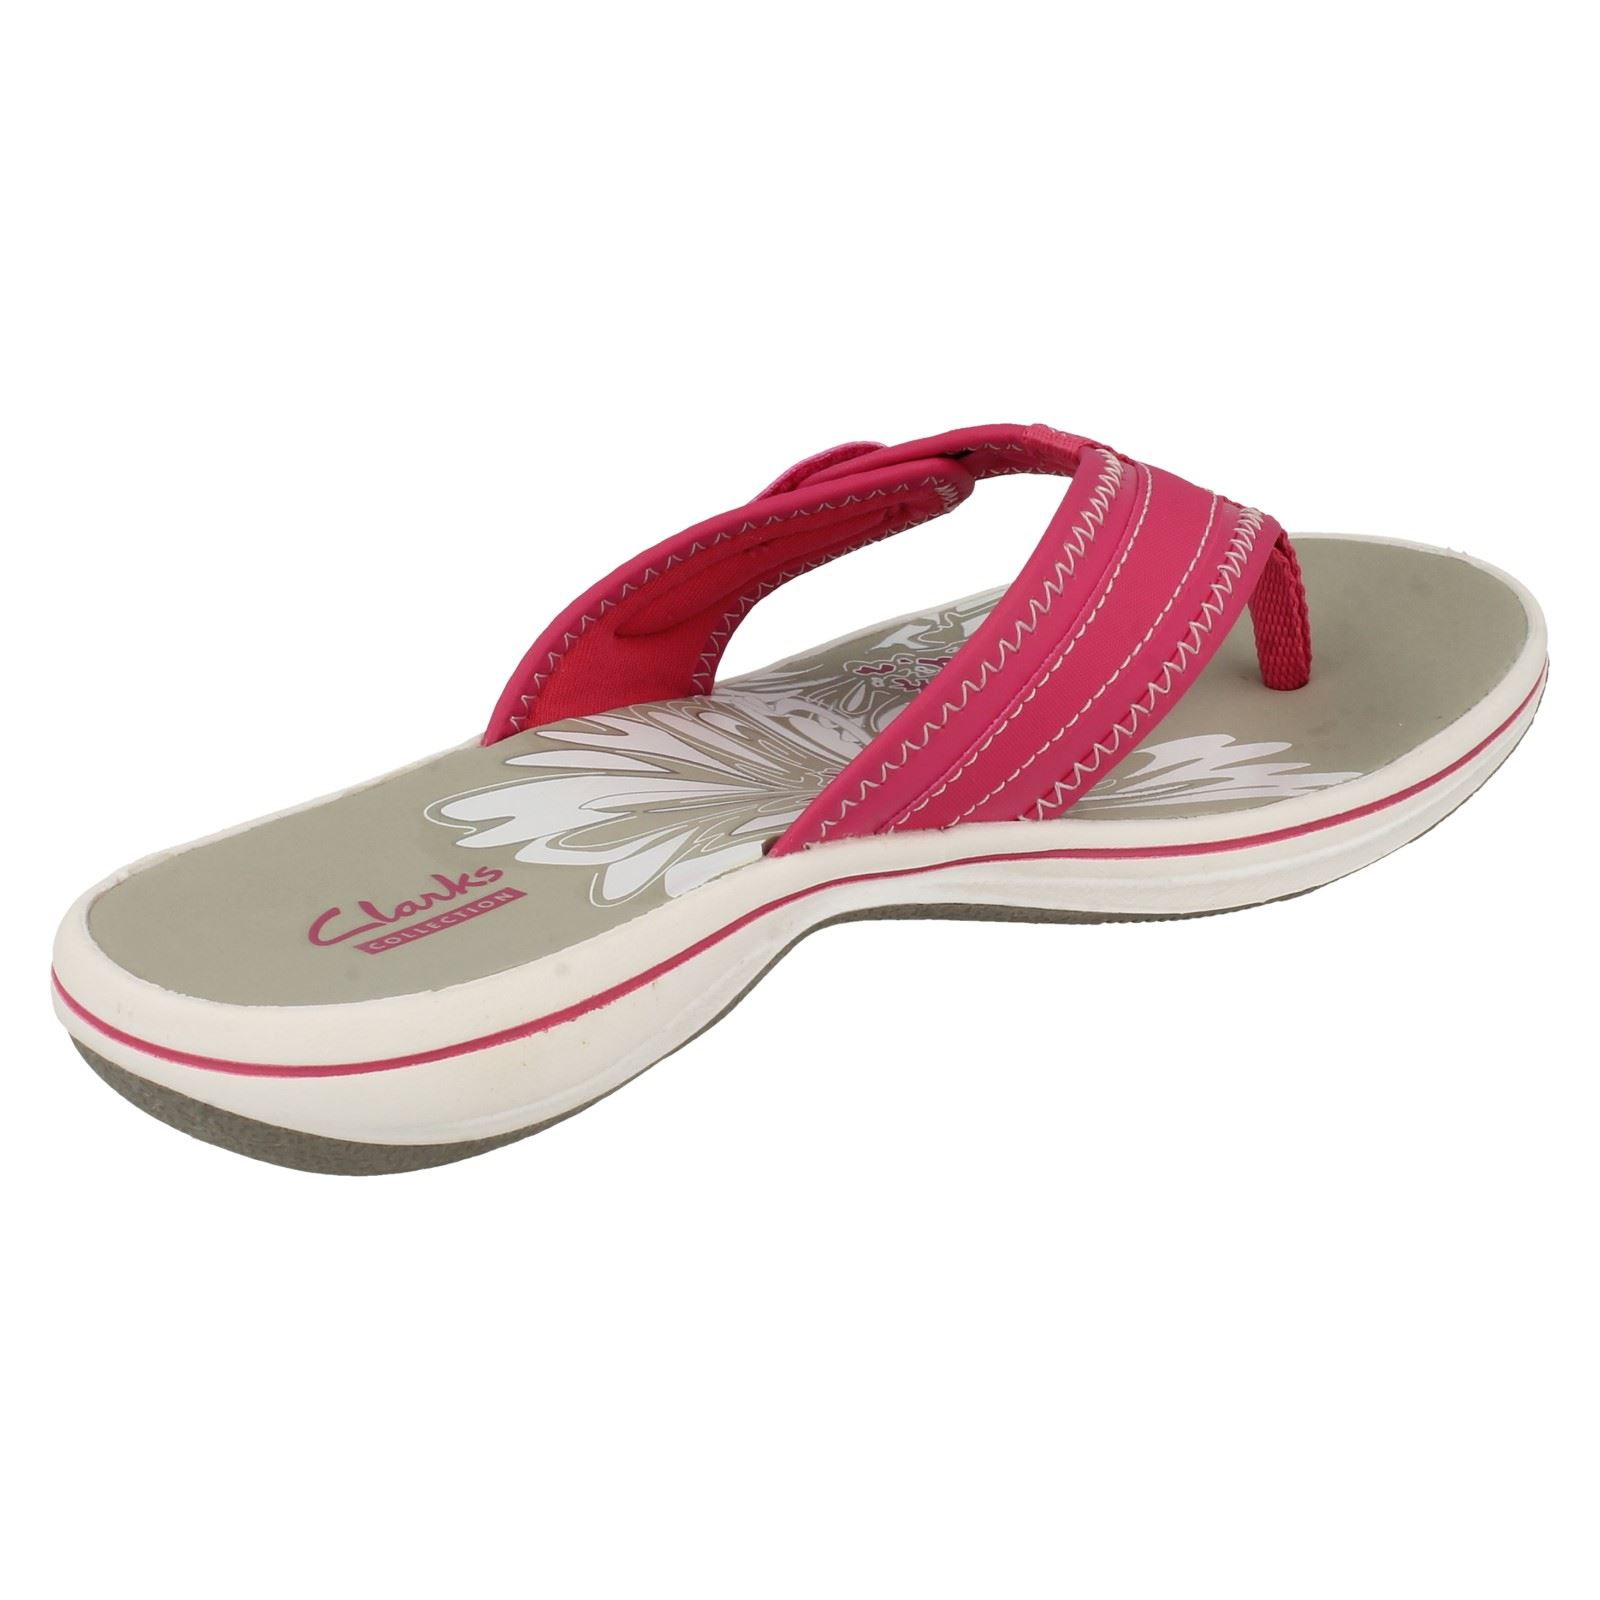 05aac59d3 Ladies-Clarks-Brinkley-Mila-Toe-Post-Sandals thumbnail 6